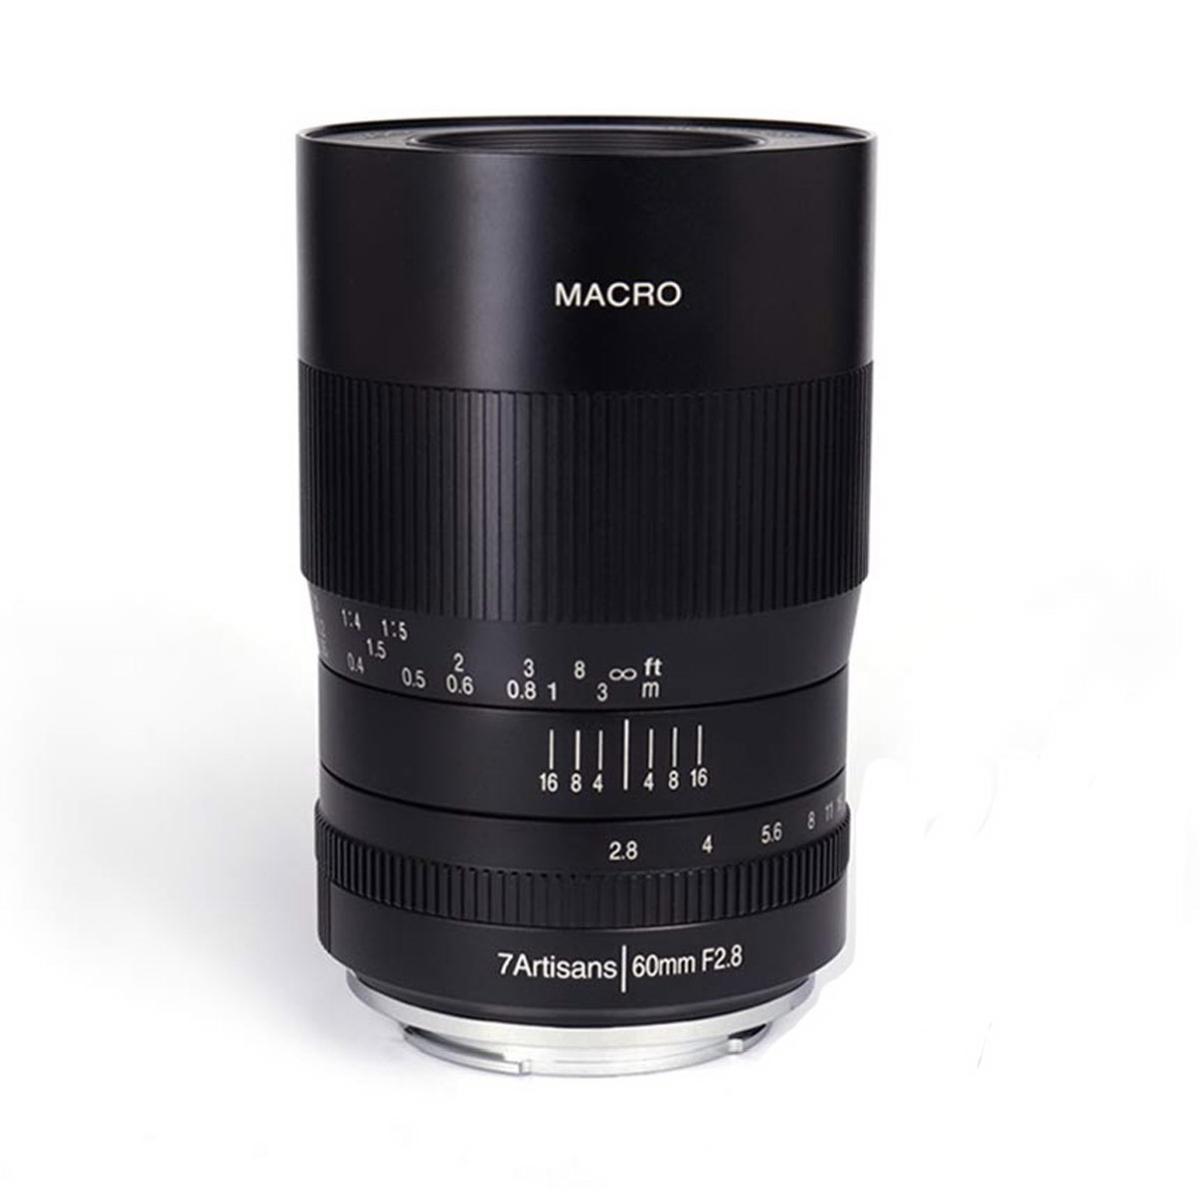 7Artisans 60 mm 1:2,8 Macro für Fujifilm X